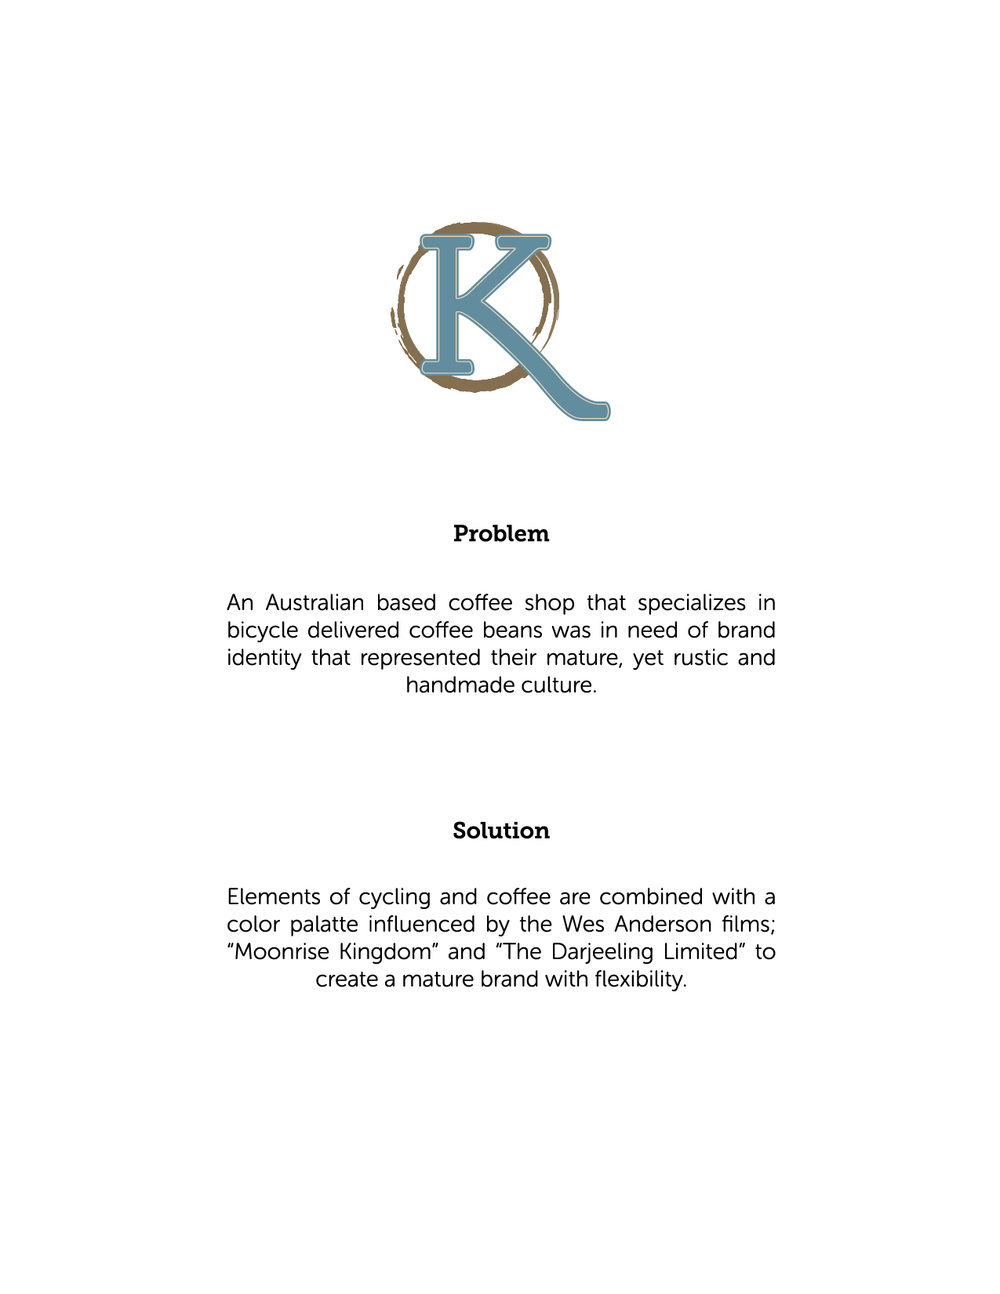 kickstand_problemsolution.jpg